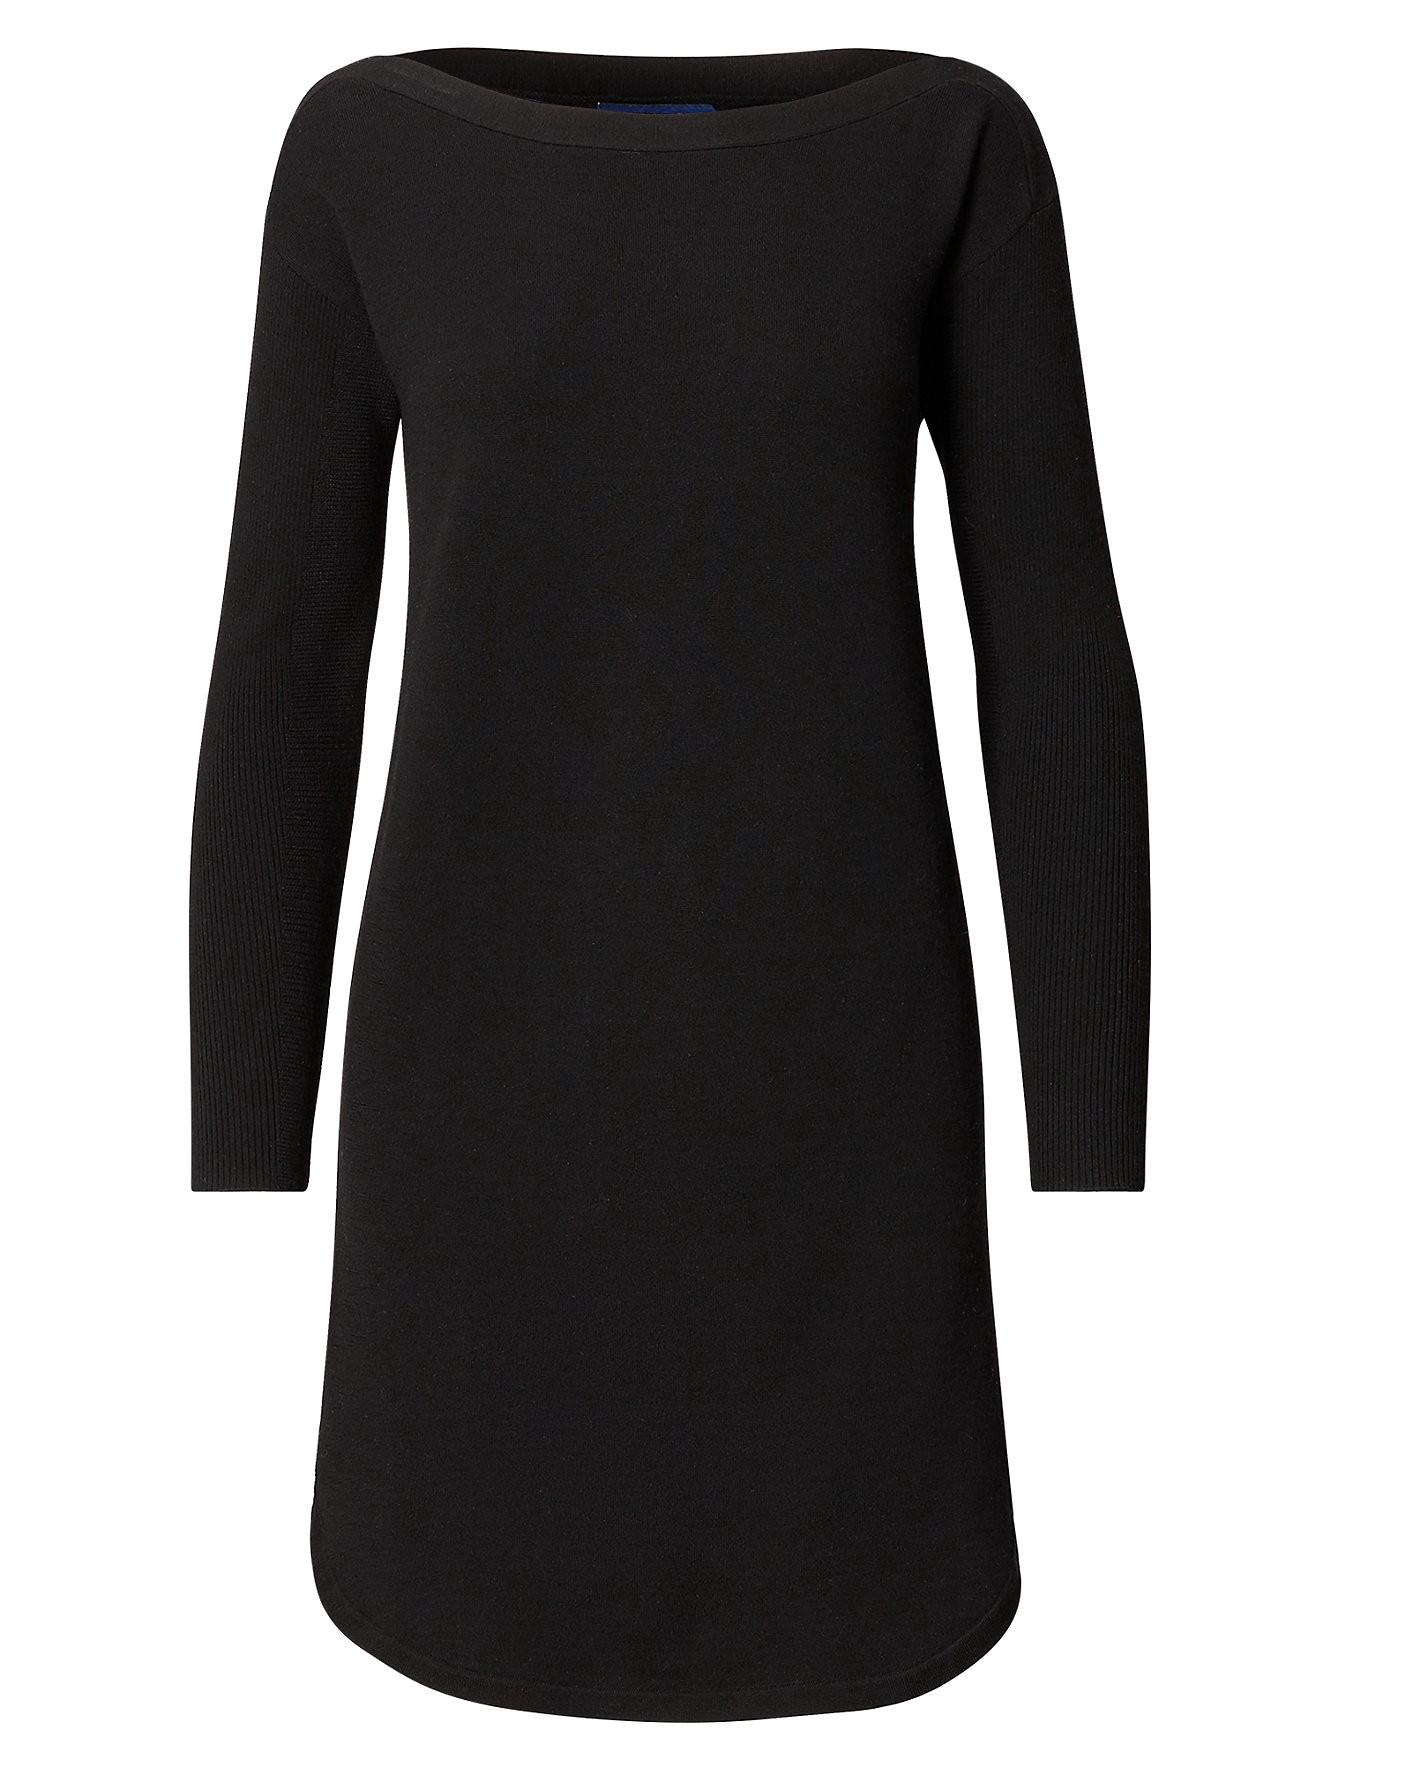 POLO RALPH LAUREN Merino Wool Shift Dress in Black